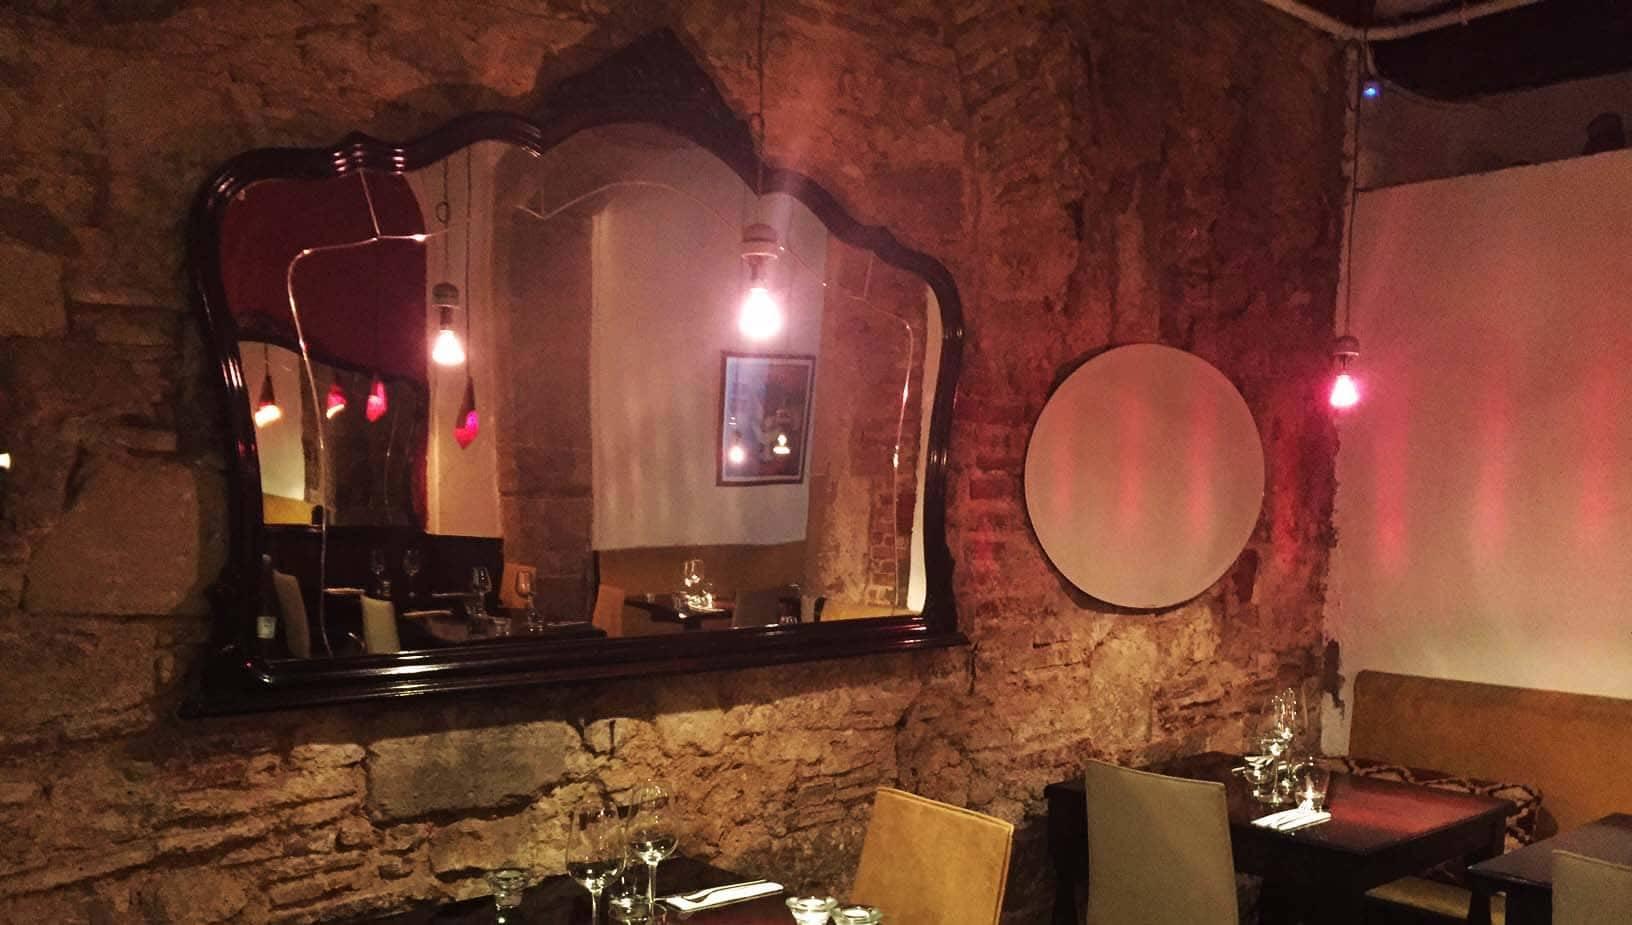 la dentellière: dining room decor